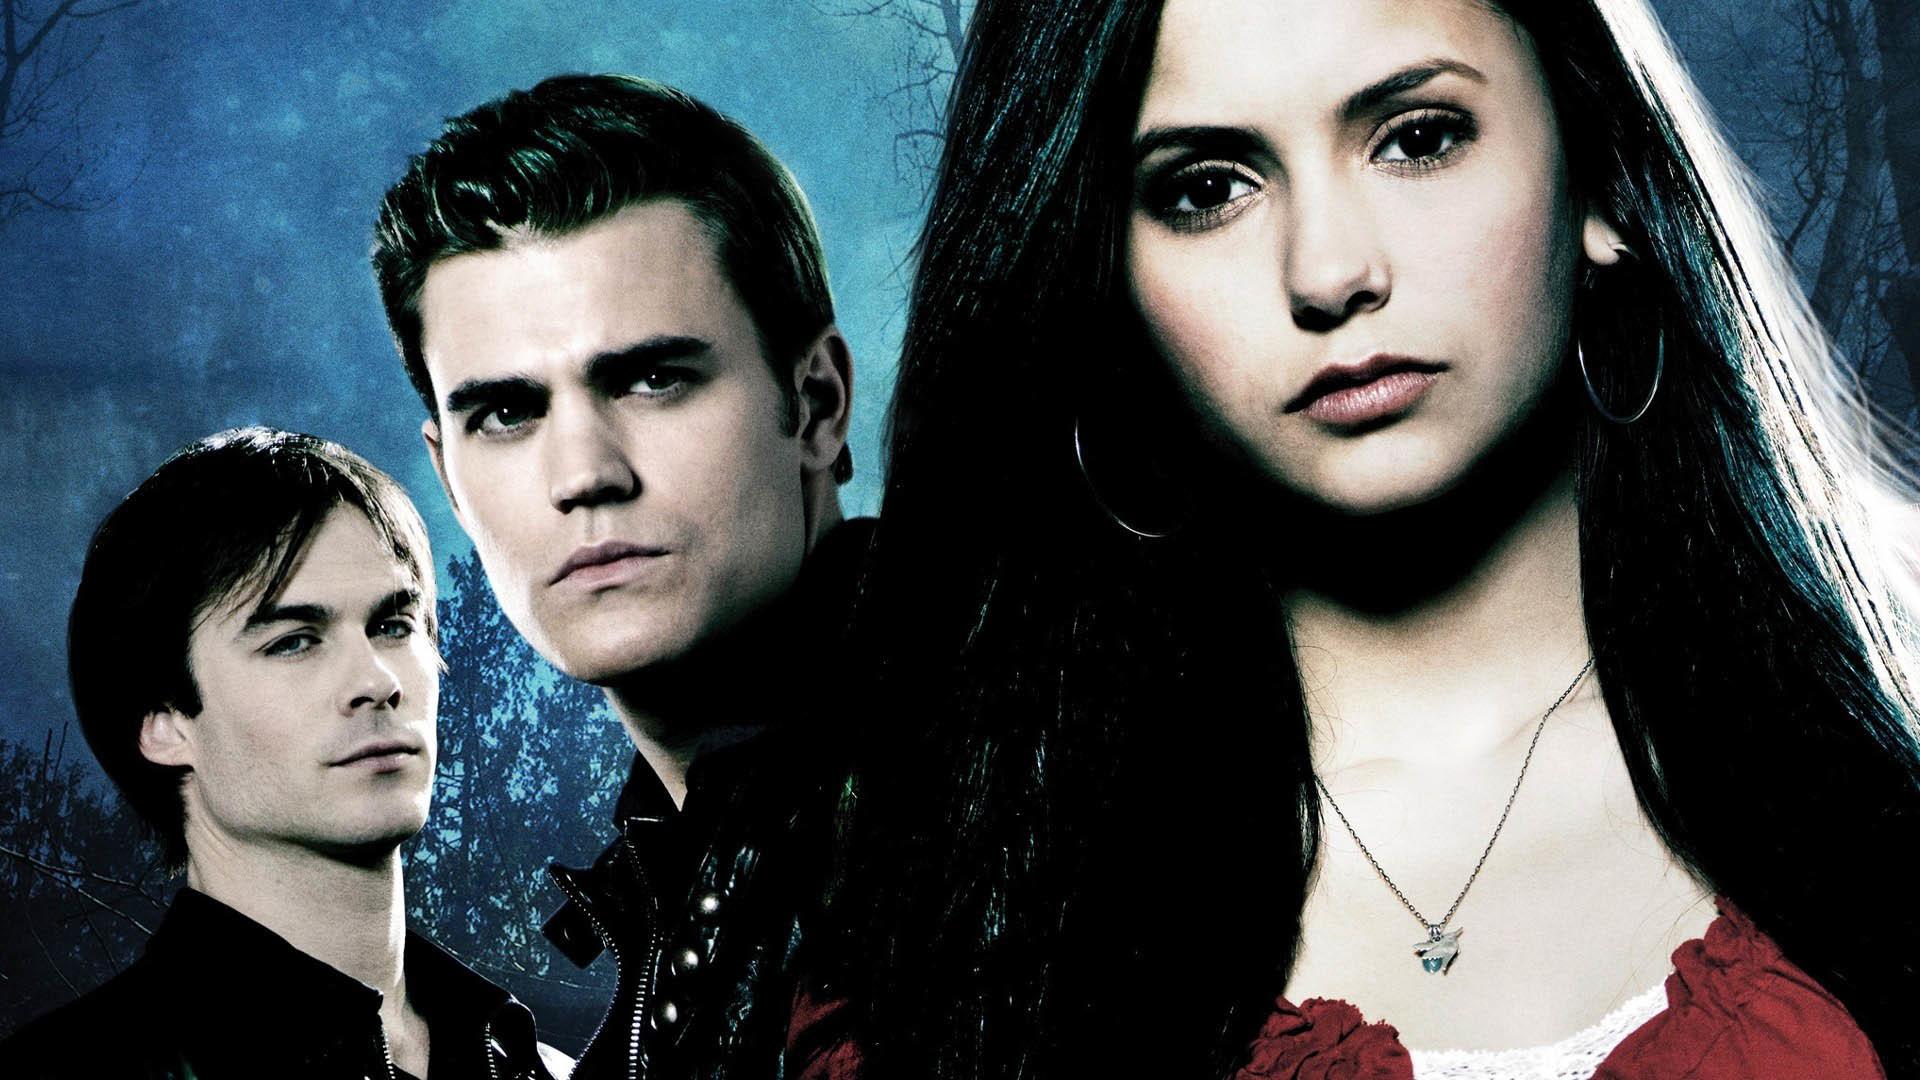 Vampire Diaries Wallpaper Damon and Elena (74+ images)